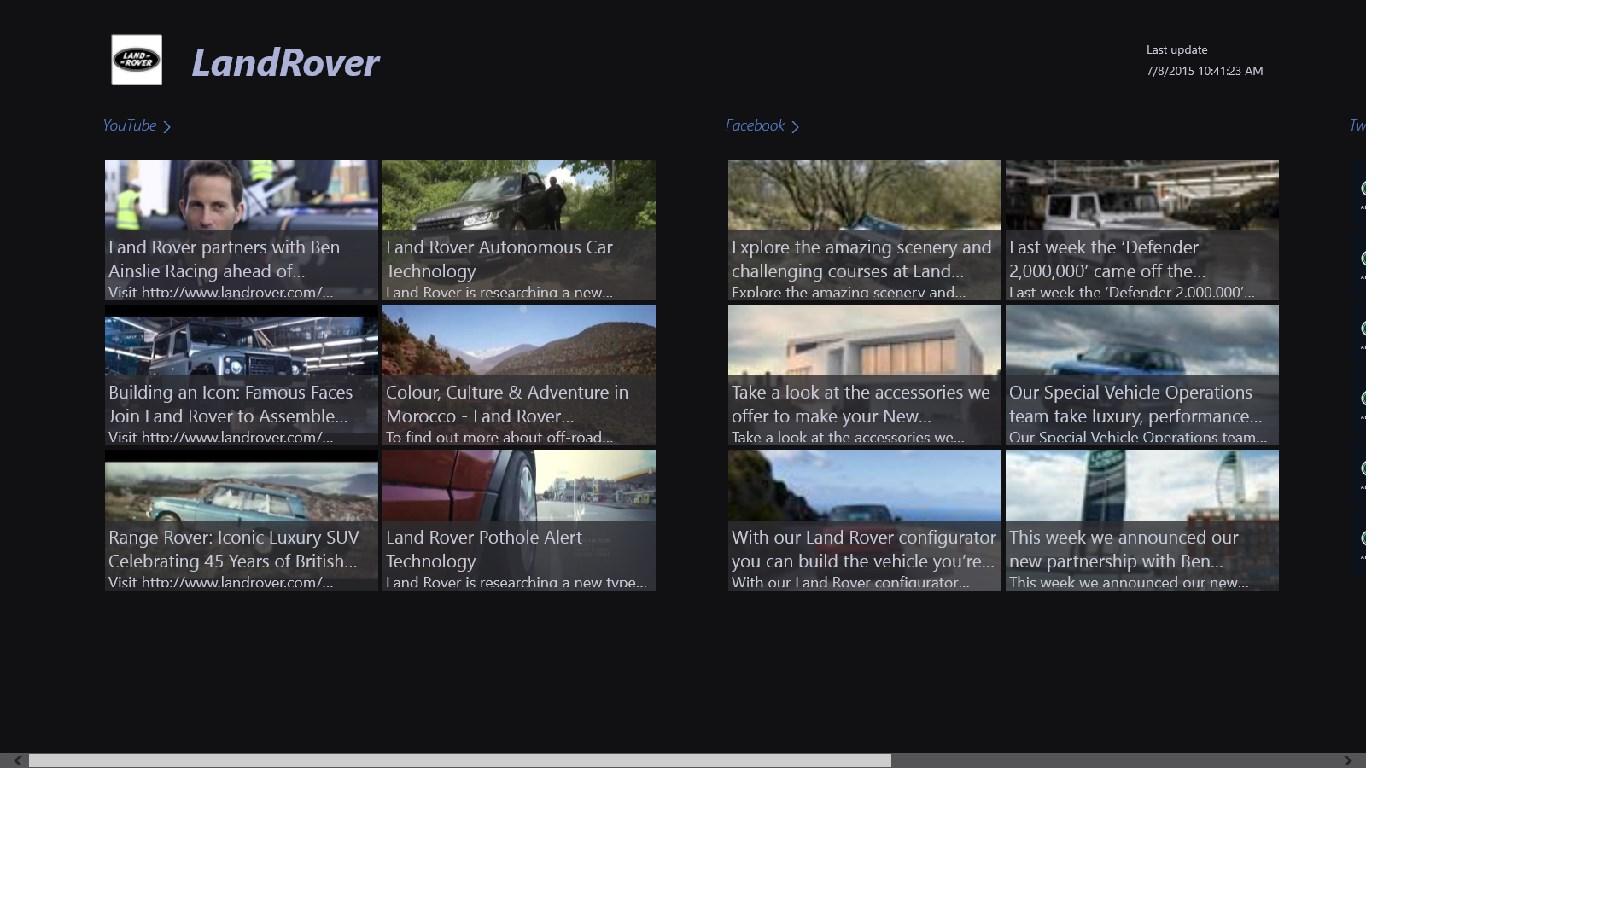 Land Rover Farmington Hills >> Land Rover cars | FREE Windows Phone app market